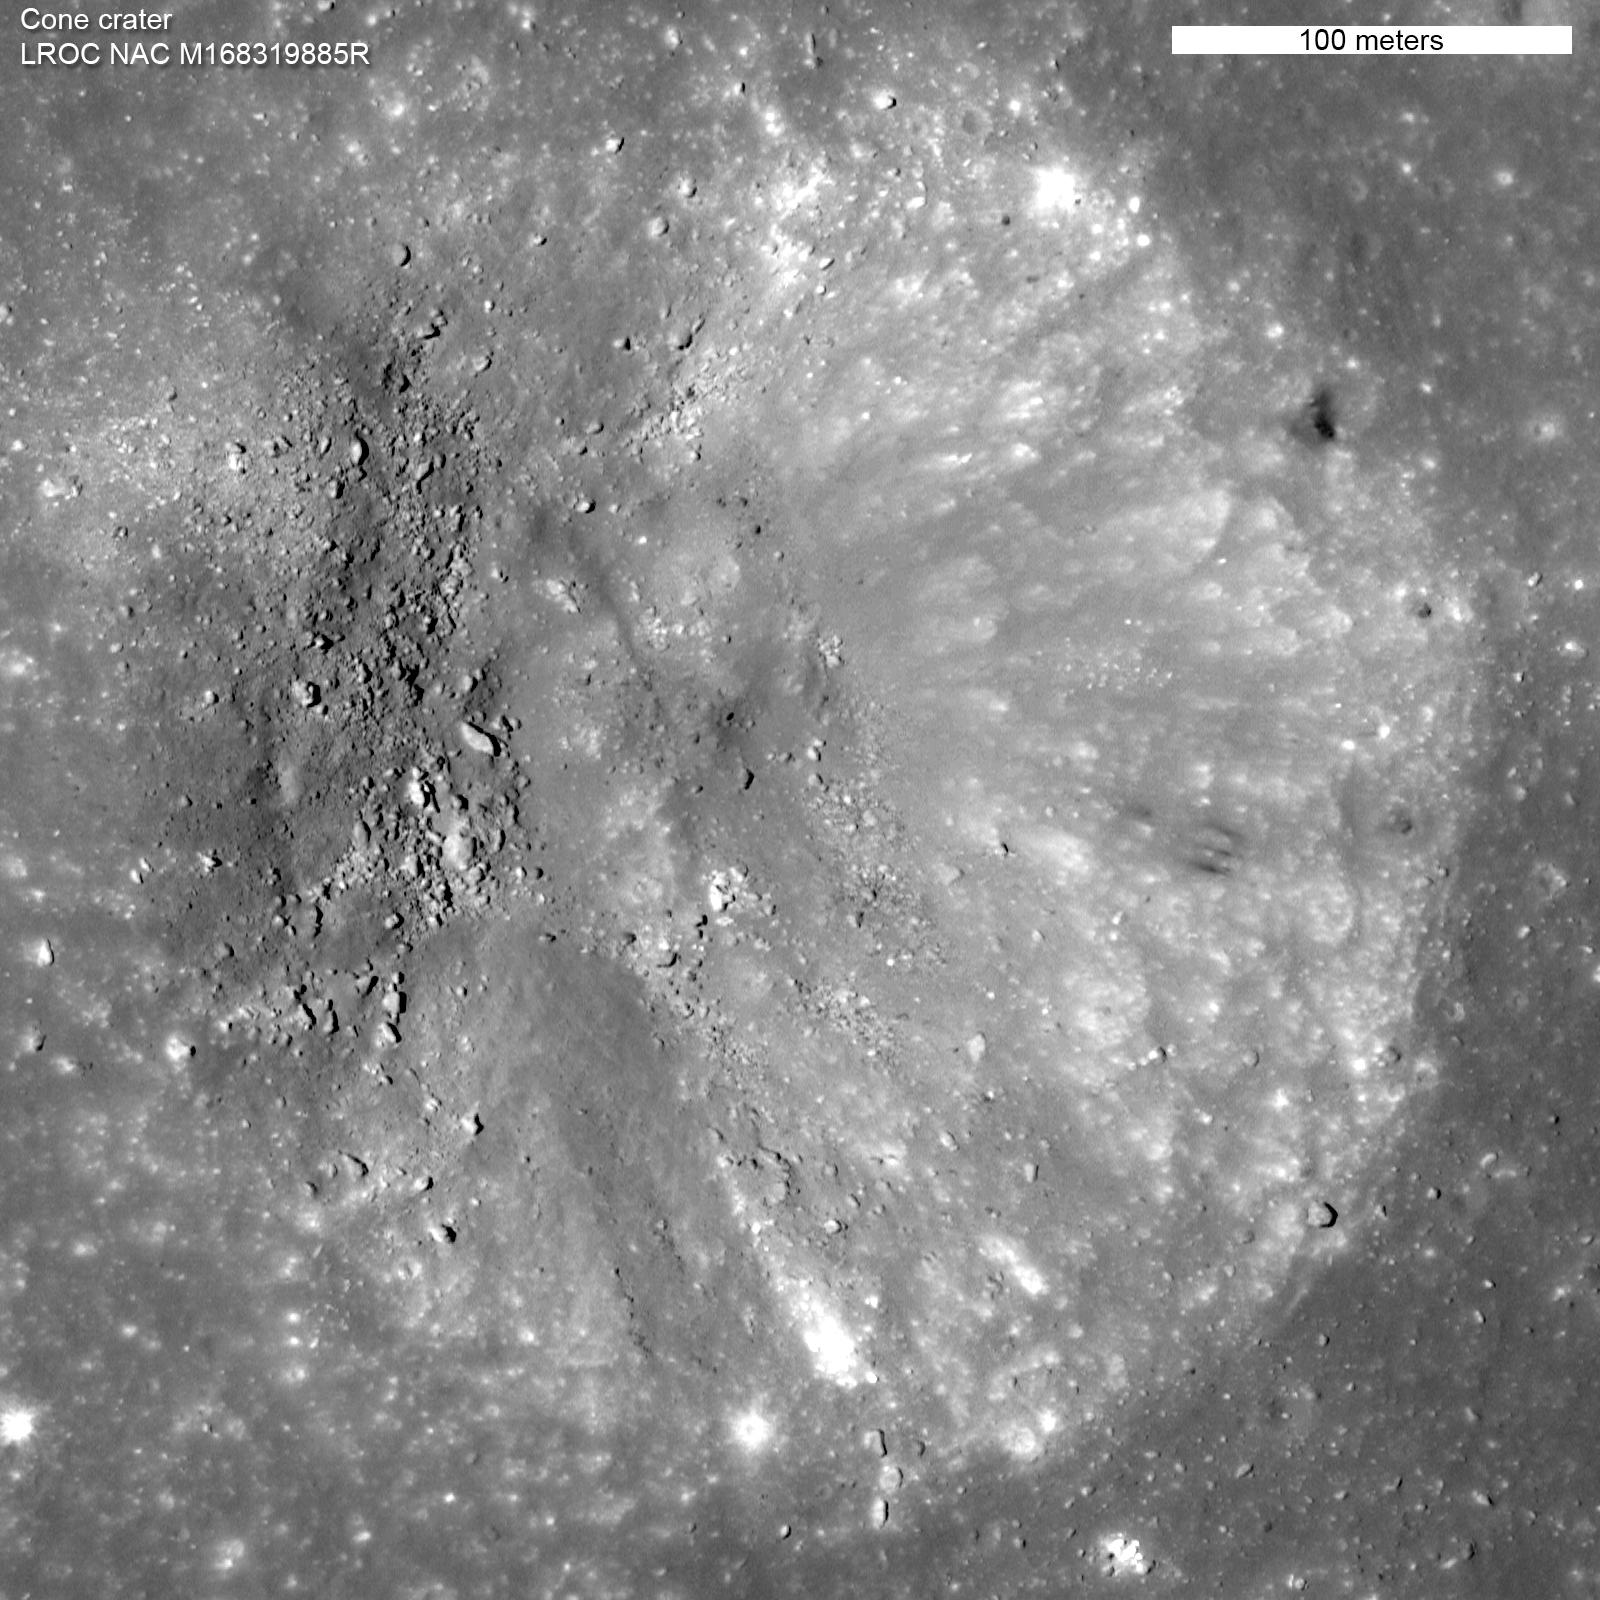 apollo 14 landing site - HD1600×1600